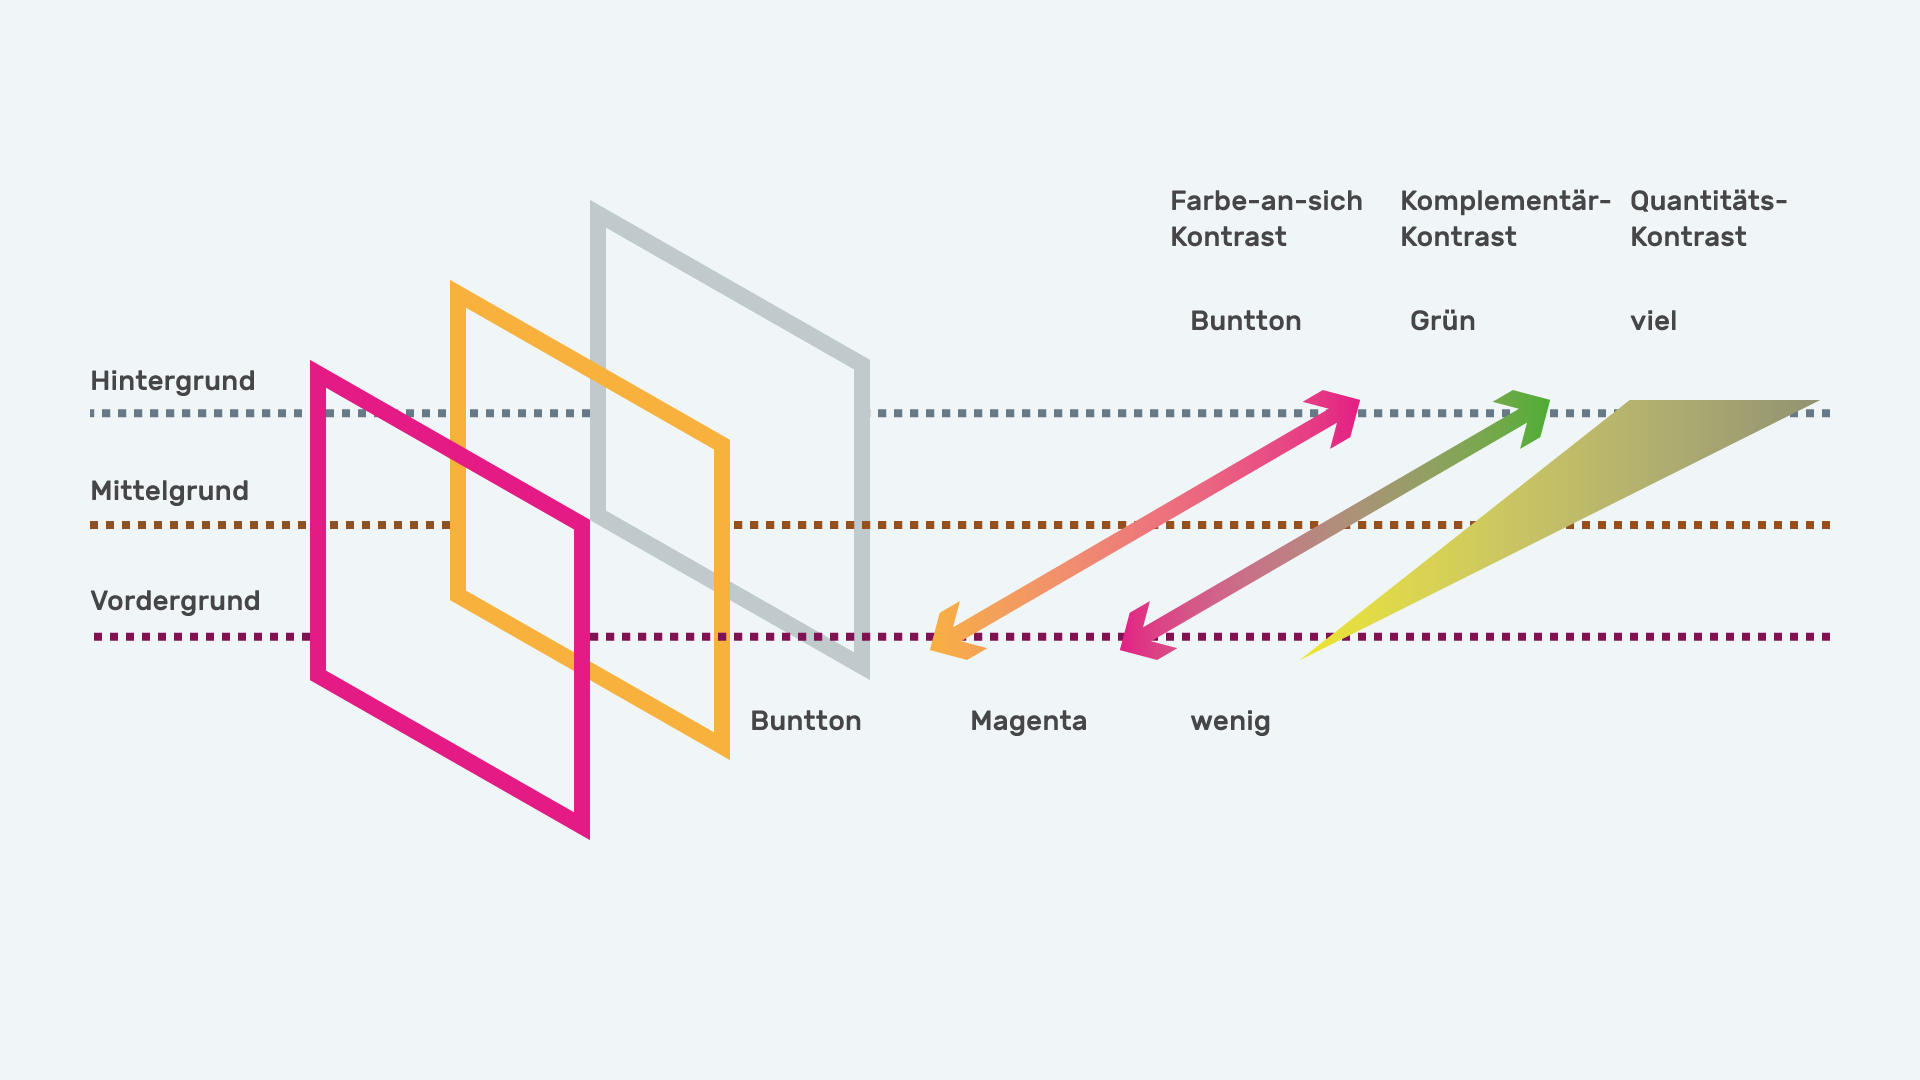 Infografik Userinterfacedesign Farbe und Funktion 01 positiv